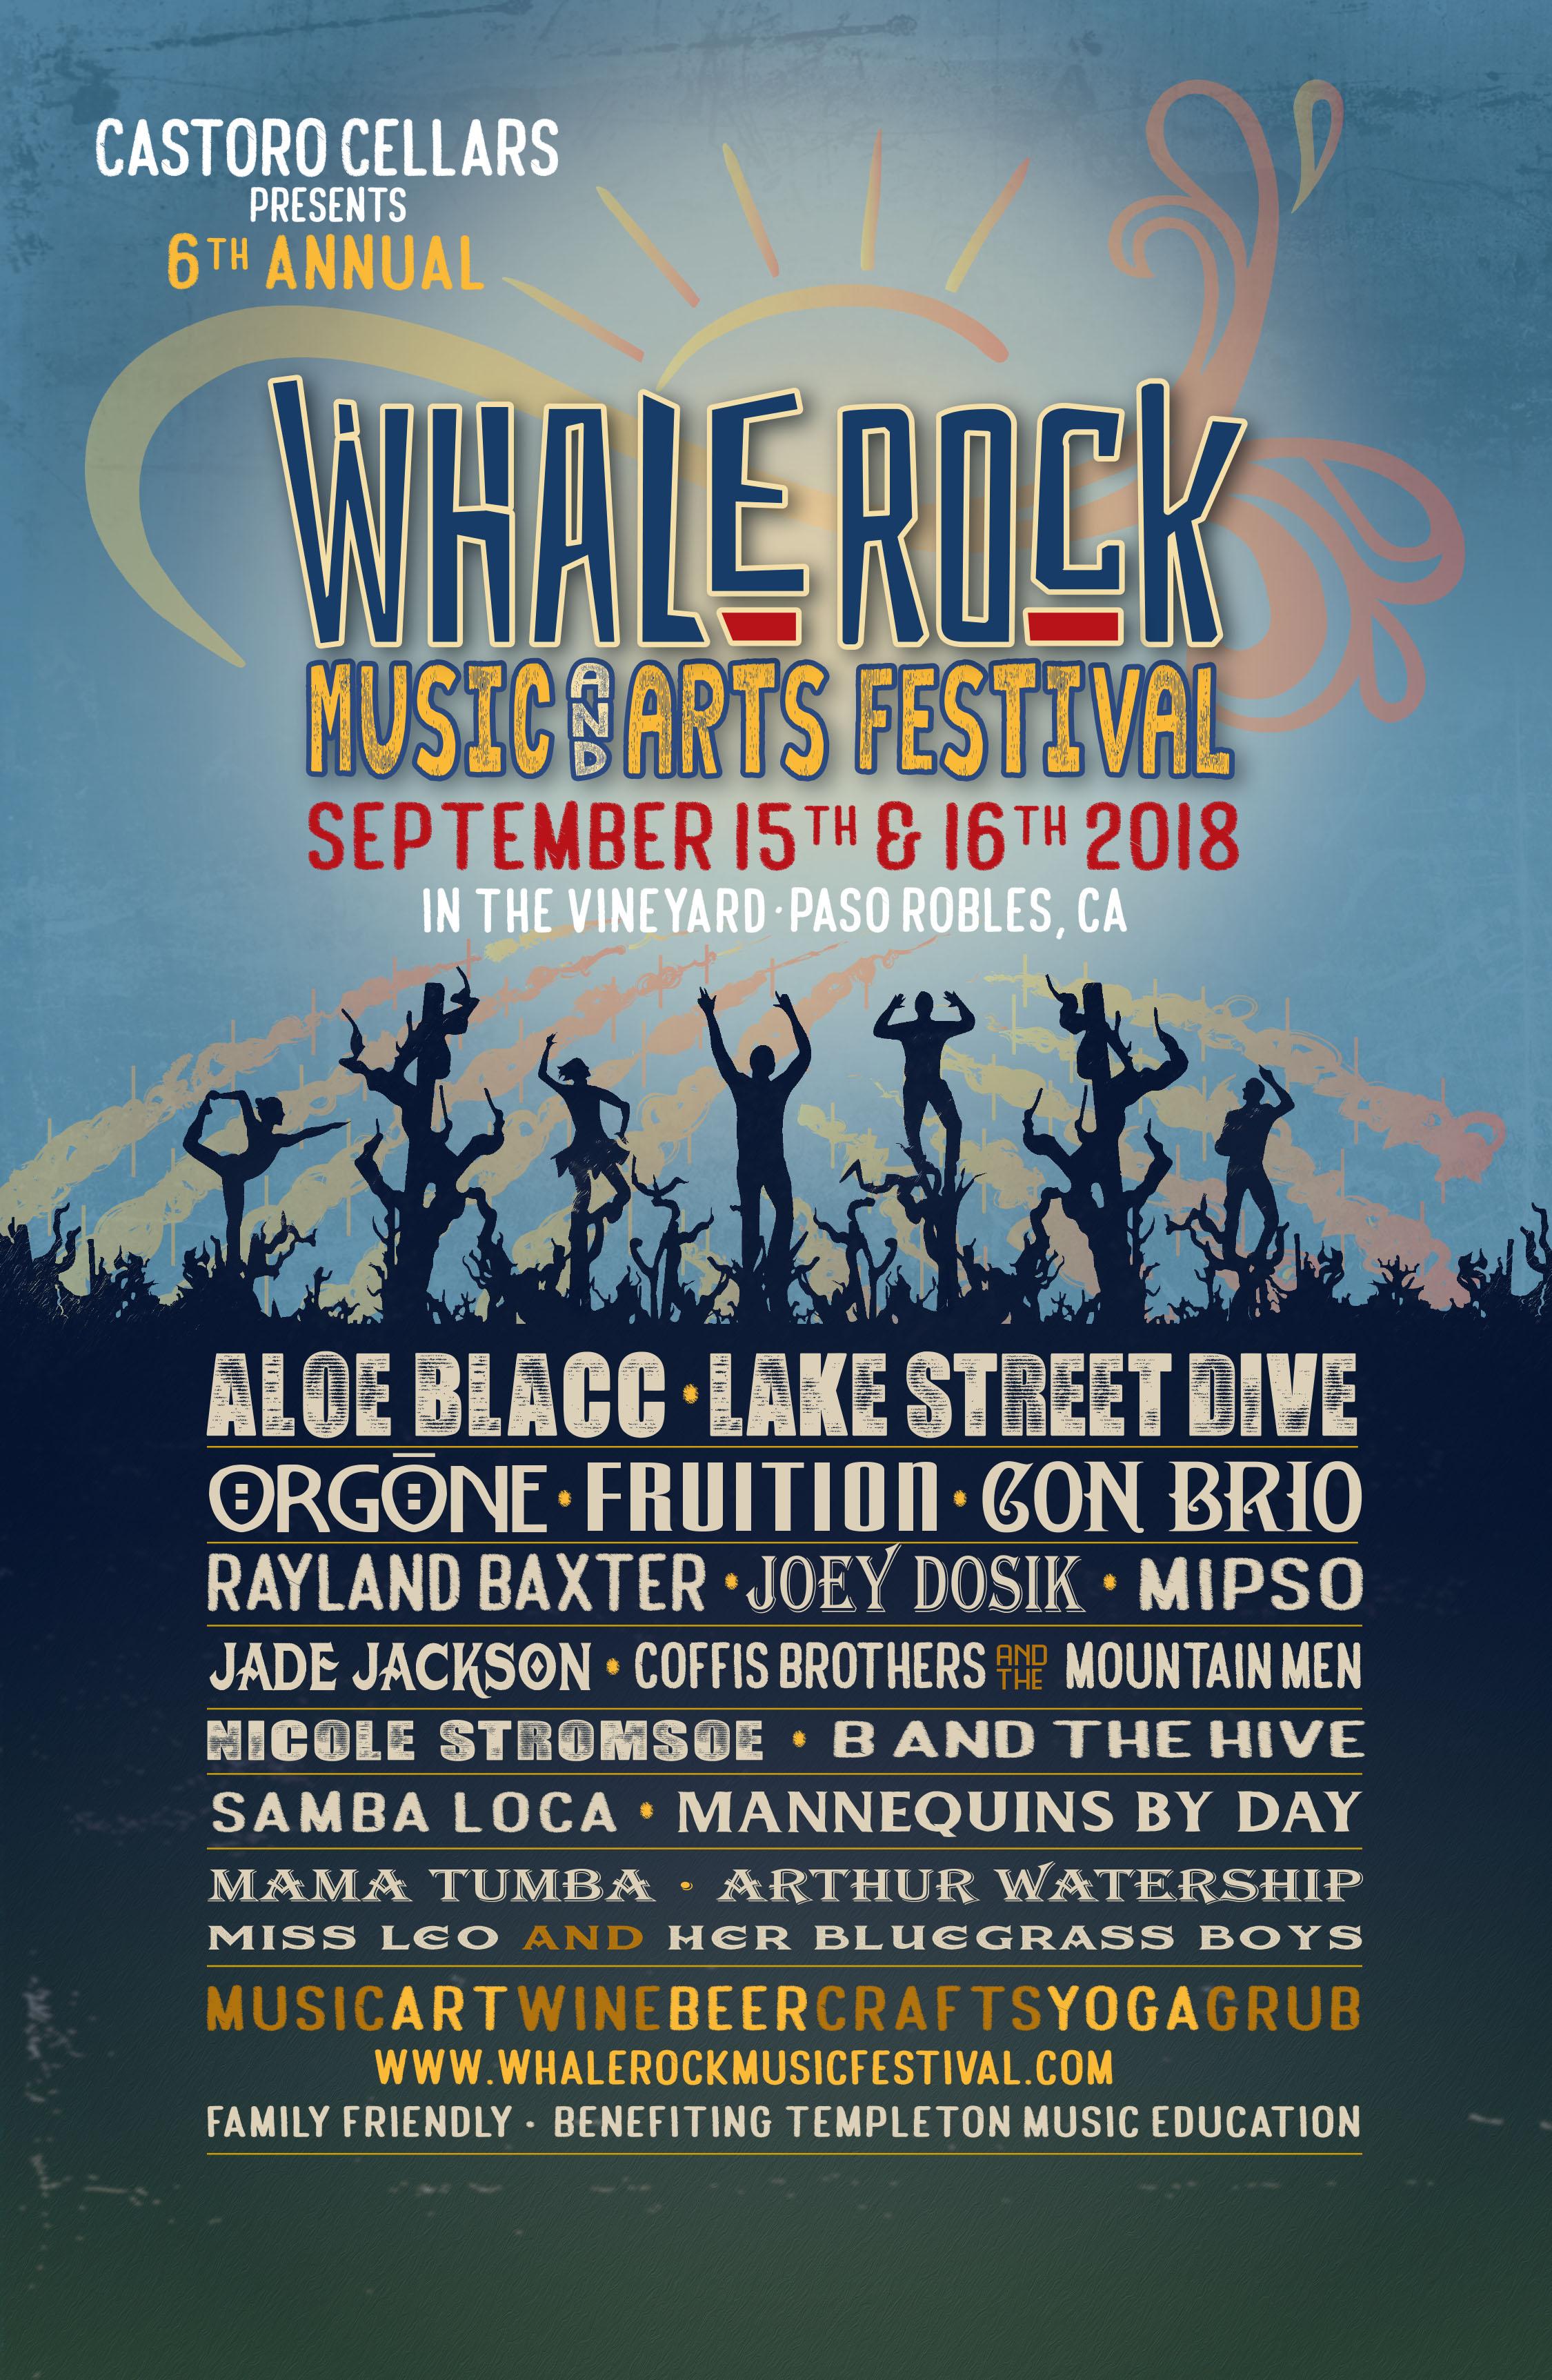 Whale Rock 2018 11x17 Poster 4-3-18_WEB.jpg